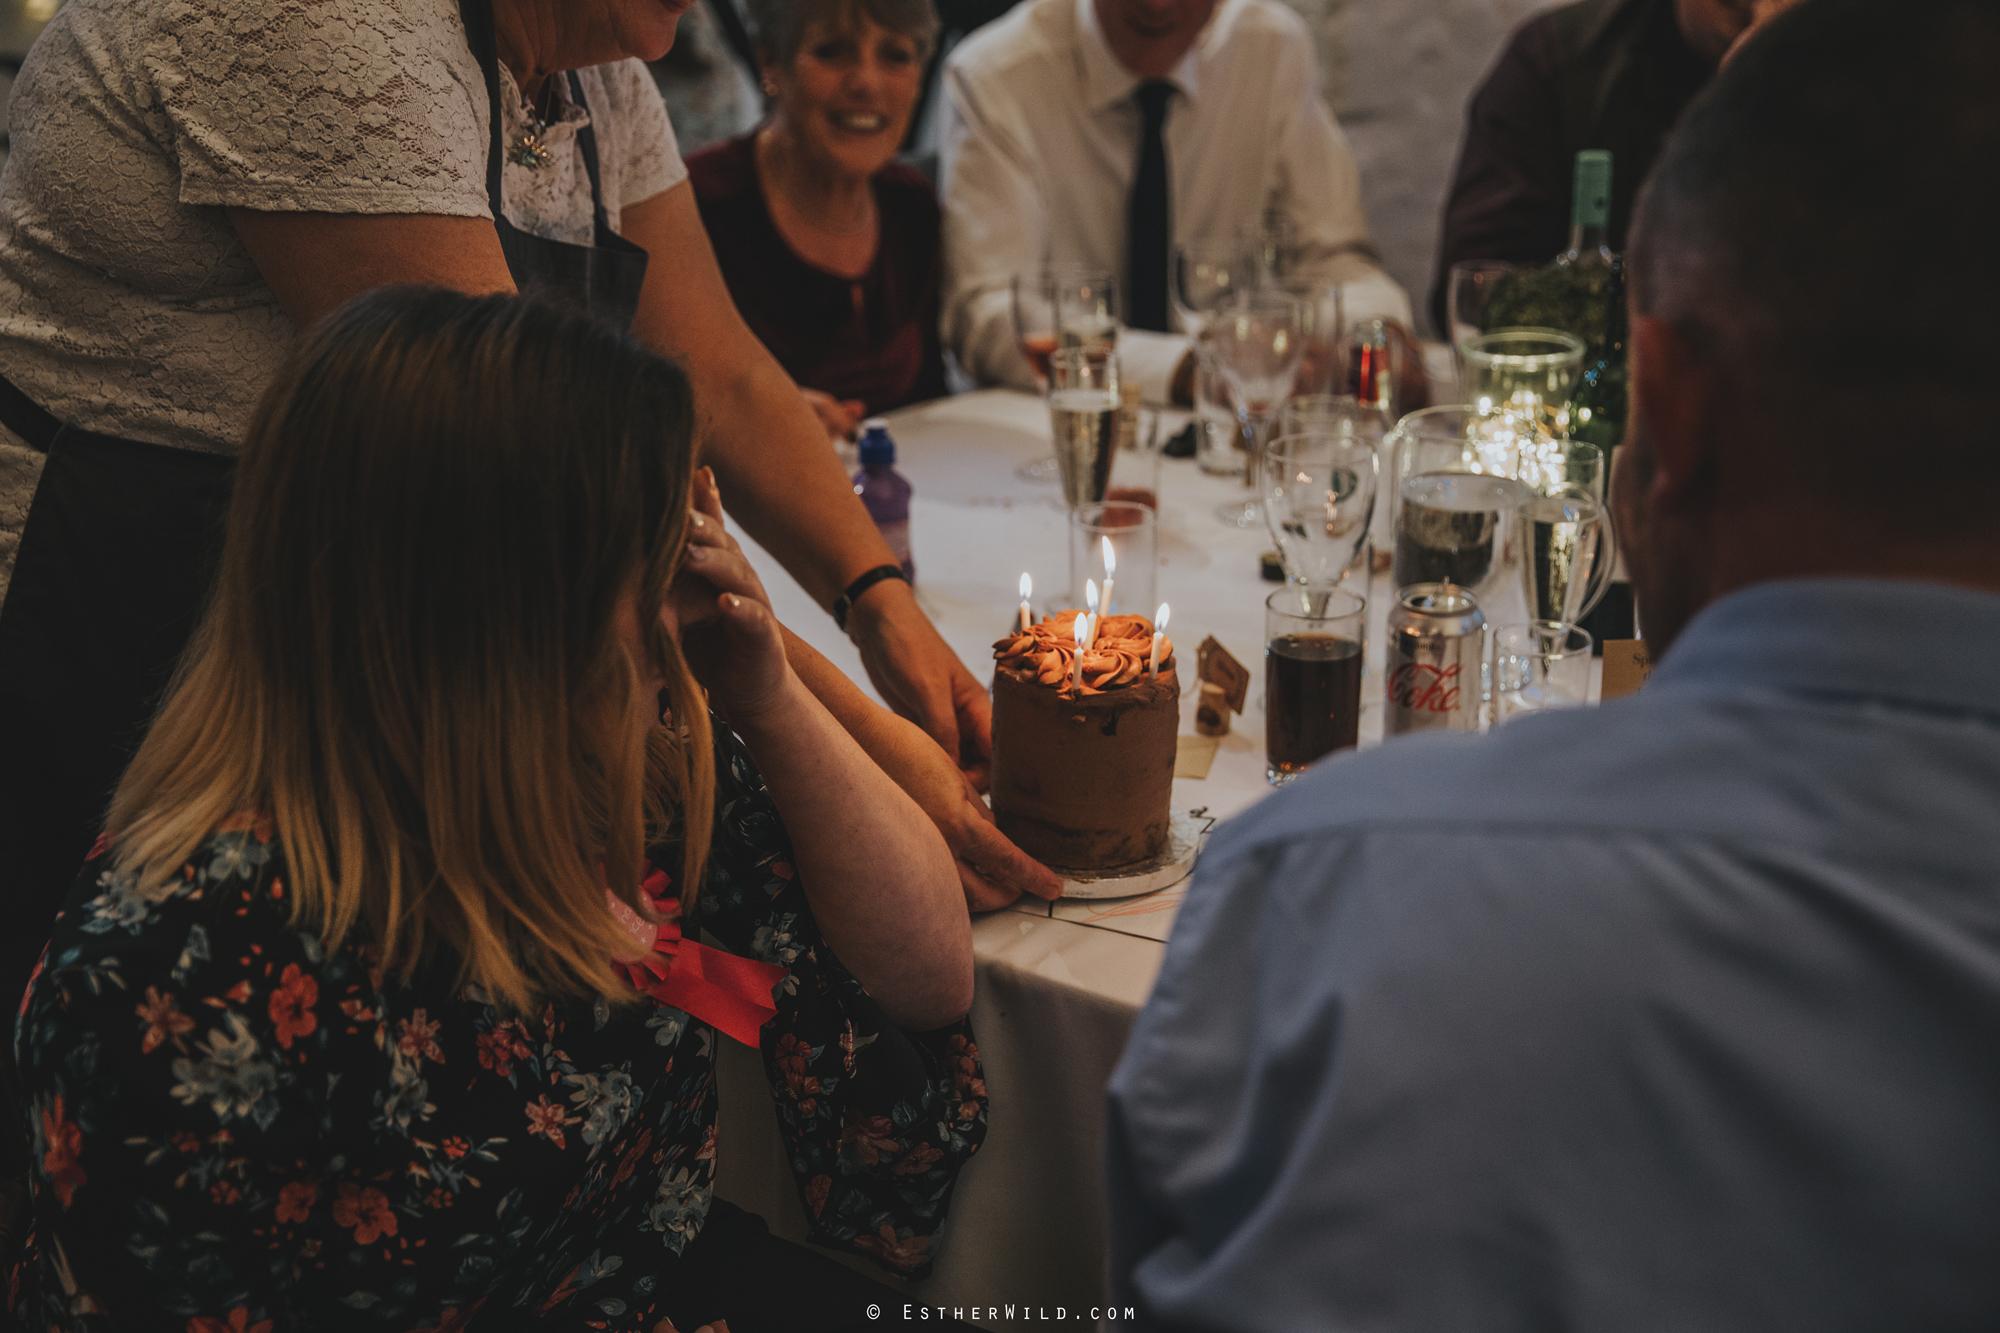 Reading_Room_Weddings_Alby_Norwich_Photographer_Esther_Wild_IMG_2477.jpg